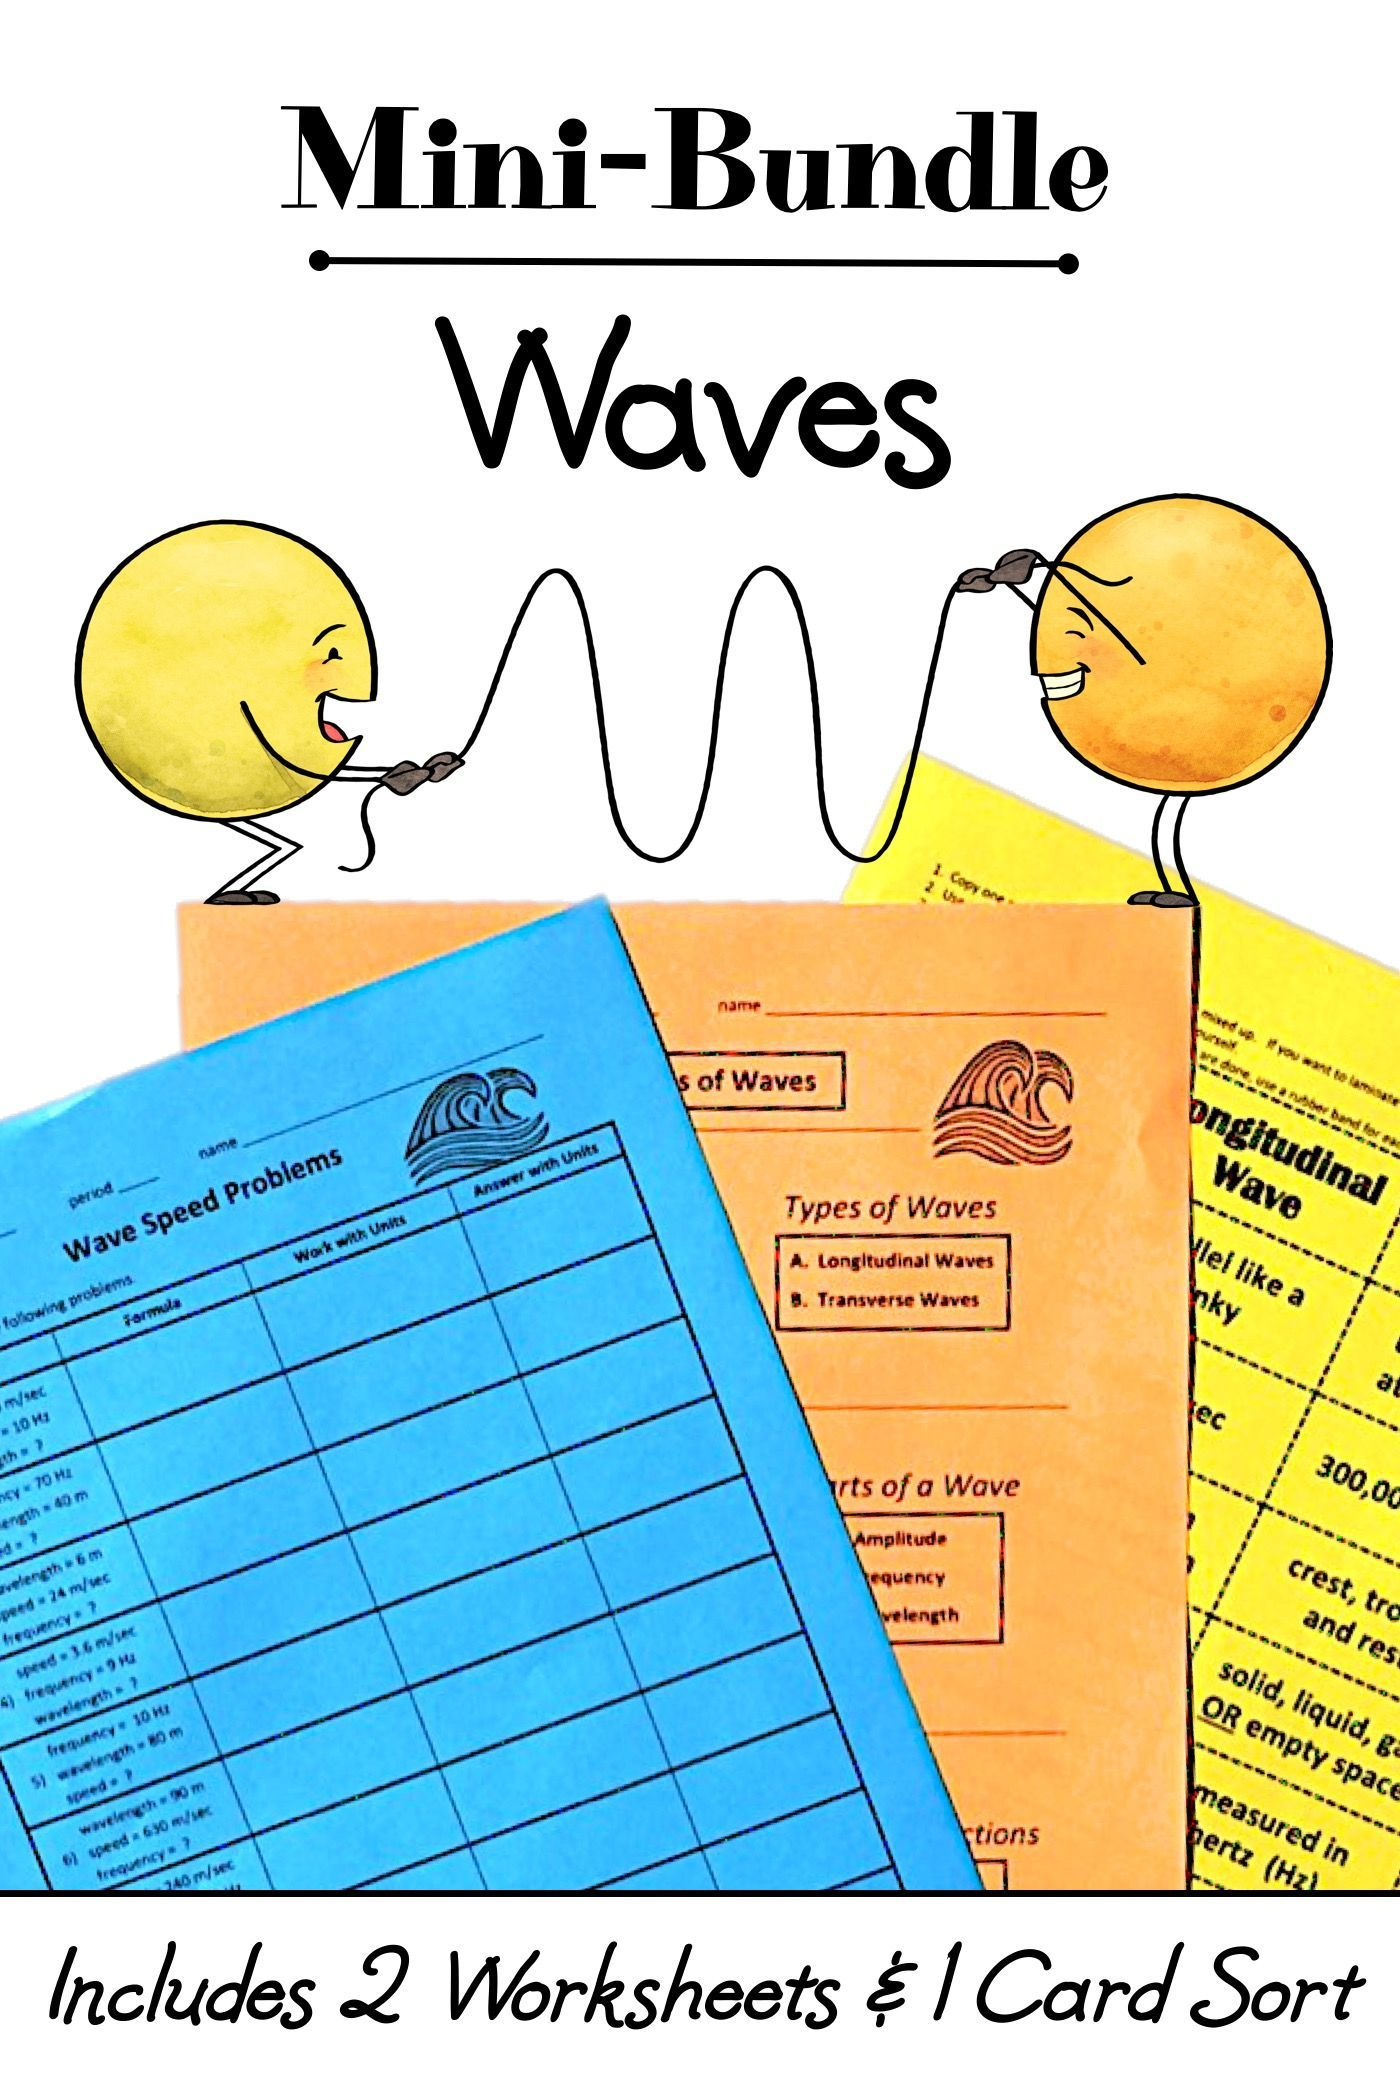 small resolution of Waves Mini-Bundle - Card Sort + 2 Worksheet Activities   Free science  worksheets